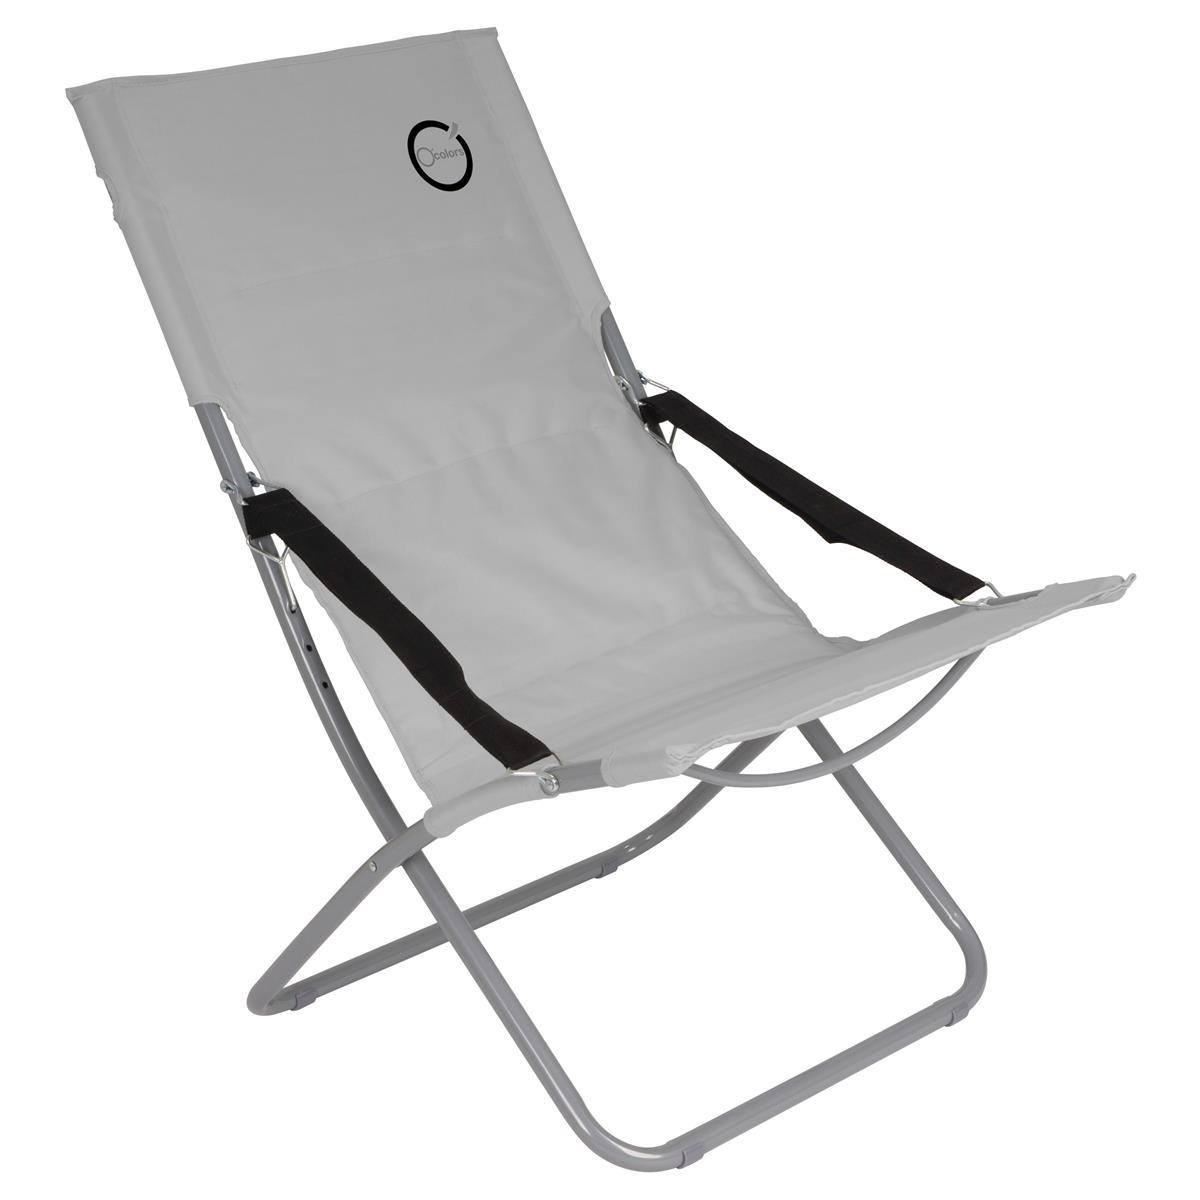 Camping Stuhl Grau klappbar Stahlrohr Gartenstuhl bis 110 kg Sessel Garten